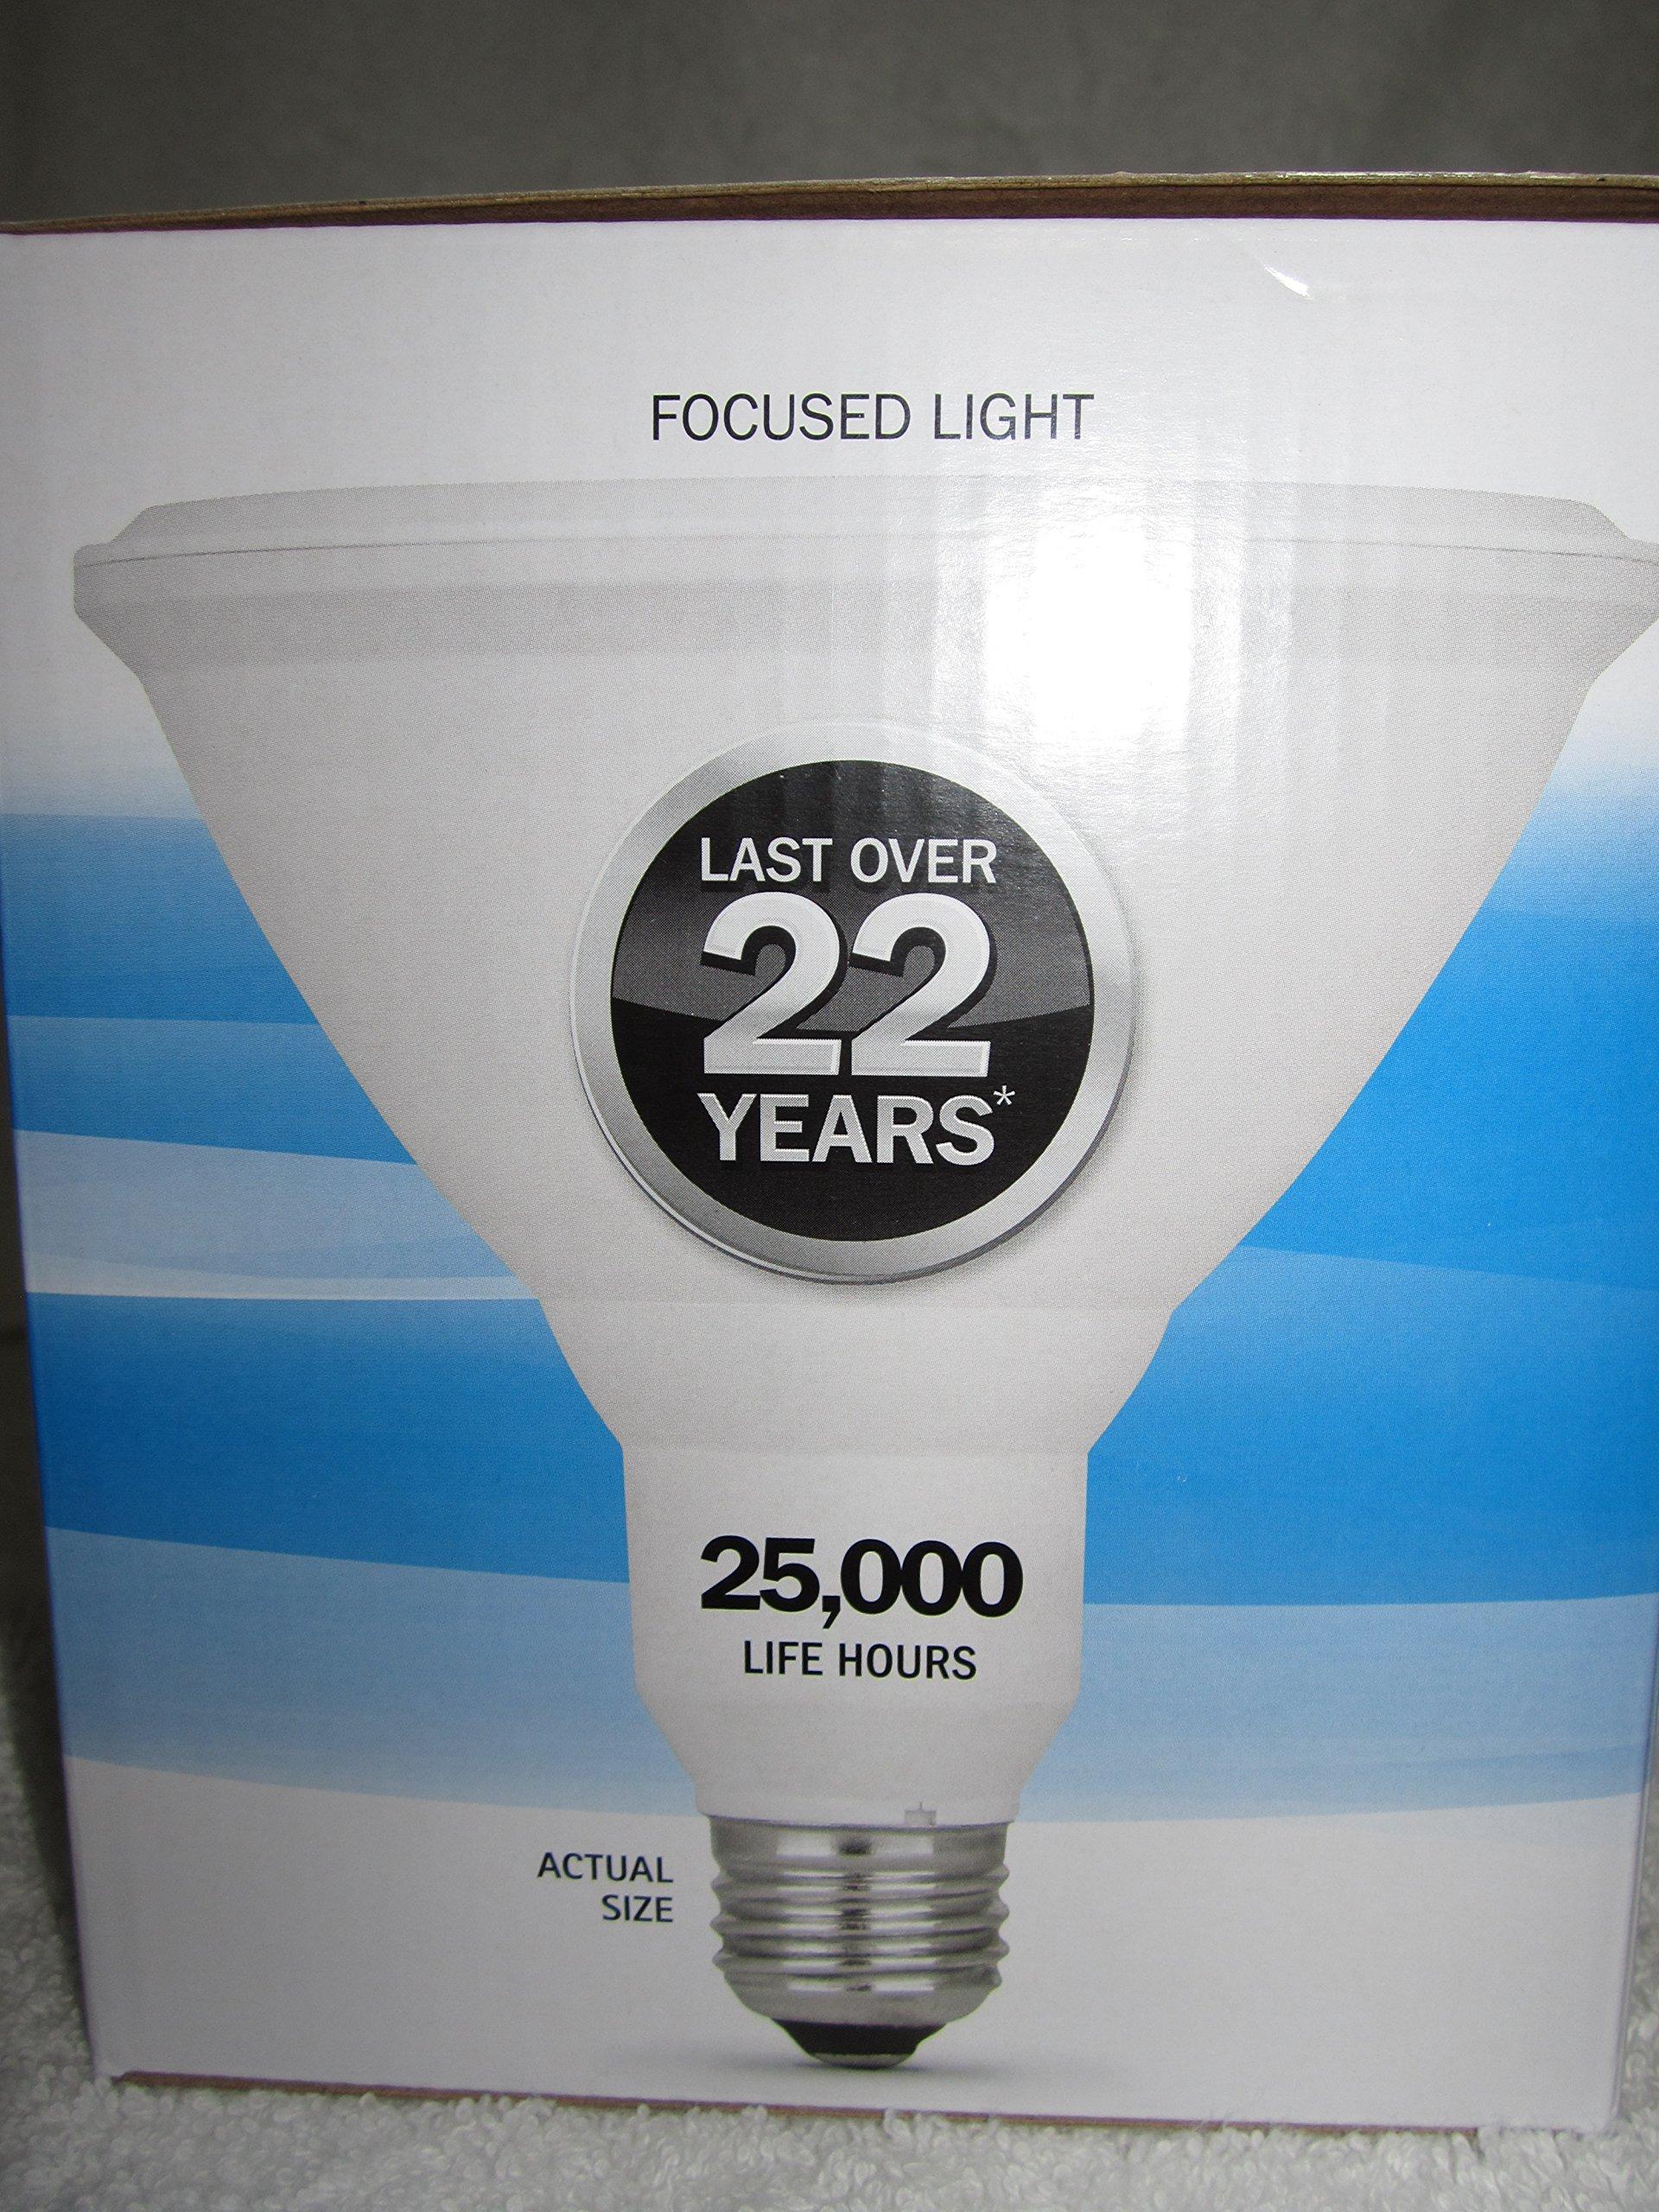 Feit Electric - PAR38 LED Bright White, Dimmable, 90 Watt (2 pack)